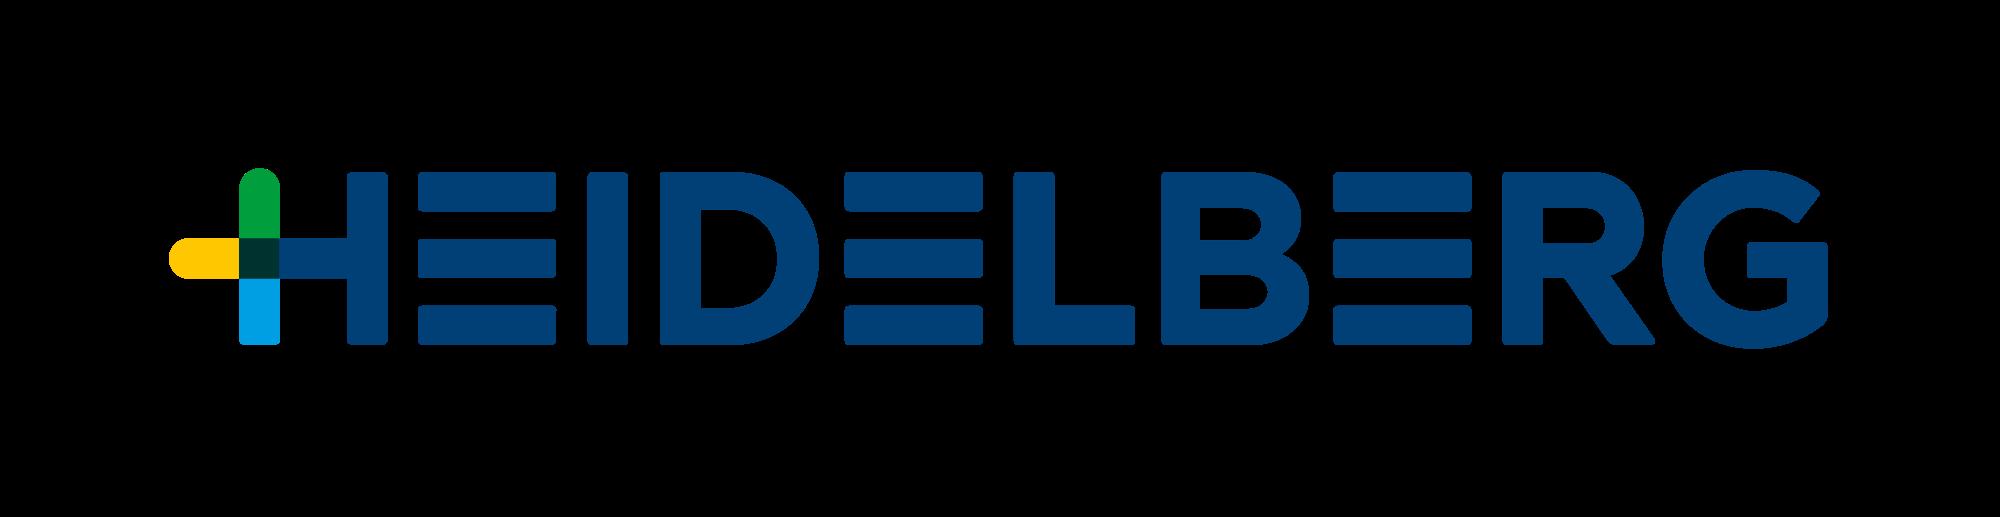 Logo der Heidelberger Druckmaschinen AG © HDM AG / CC BY-SA 4.0